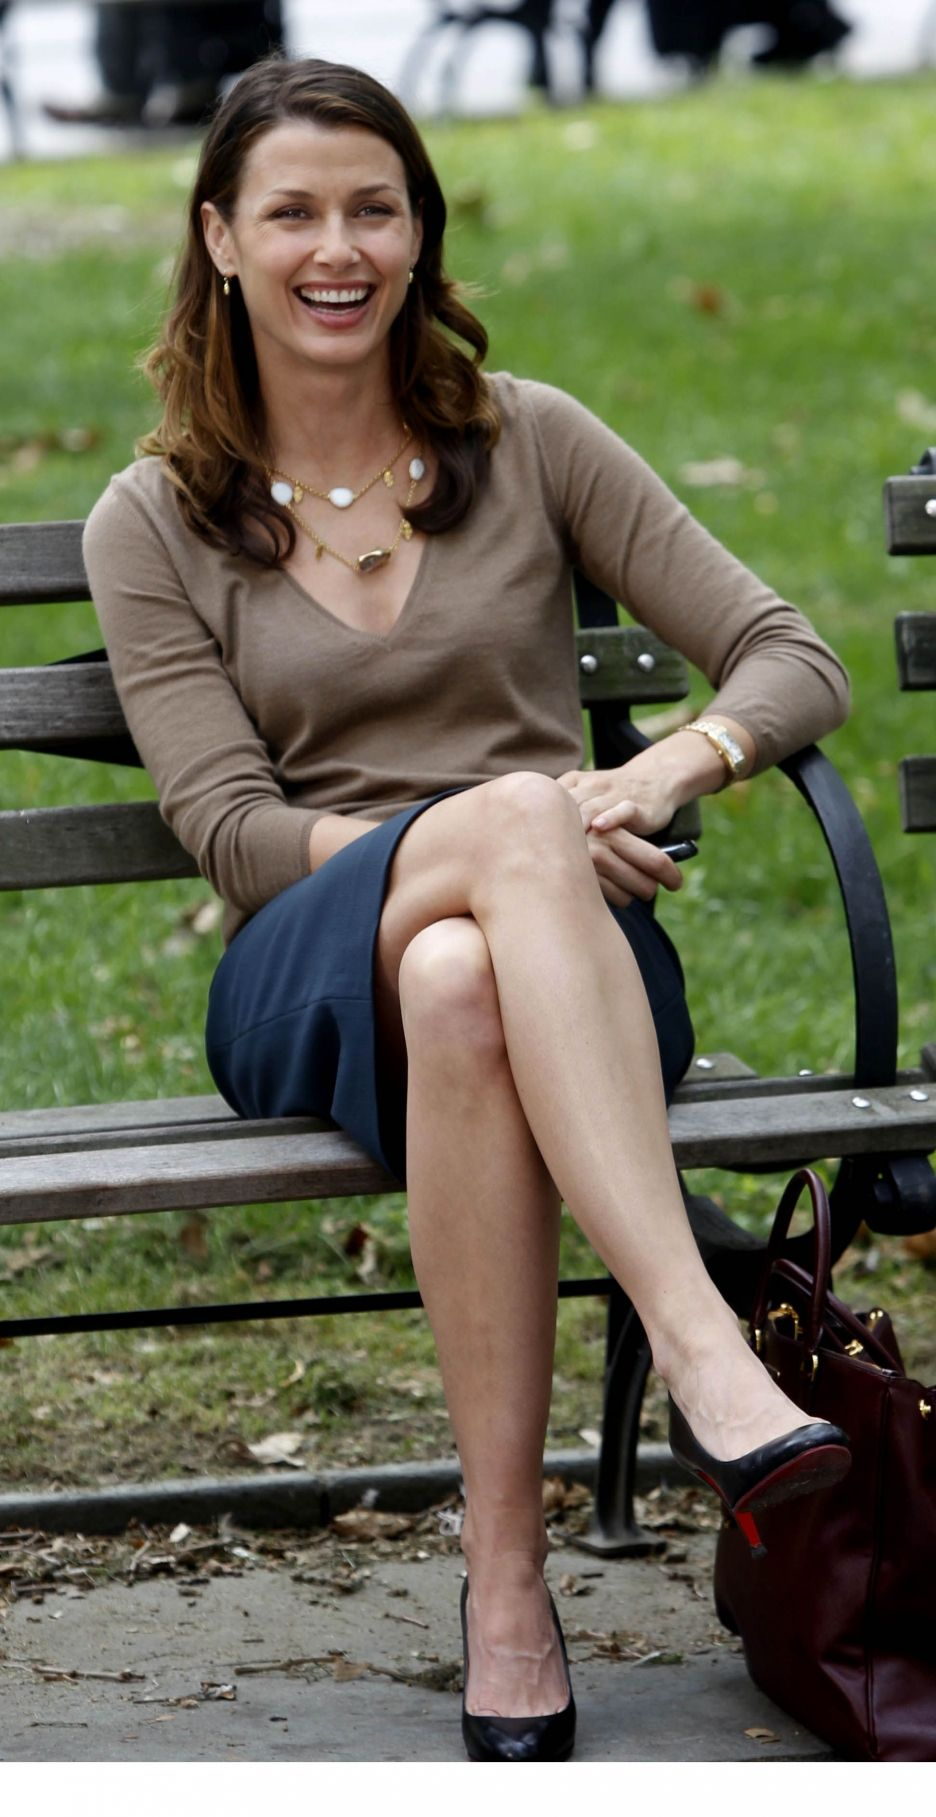 Amy Carlson Bilder bridget moynahan … | bridget moynahan, blue bloods tv show